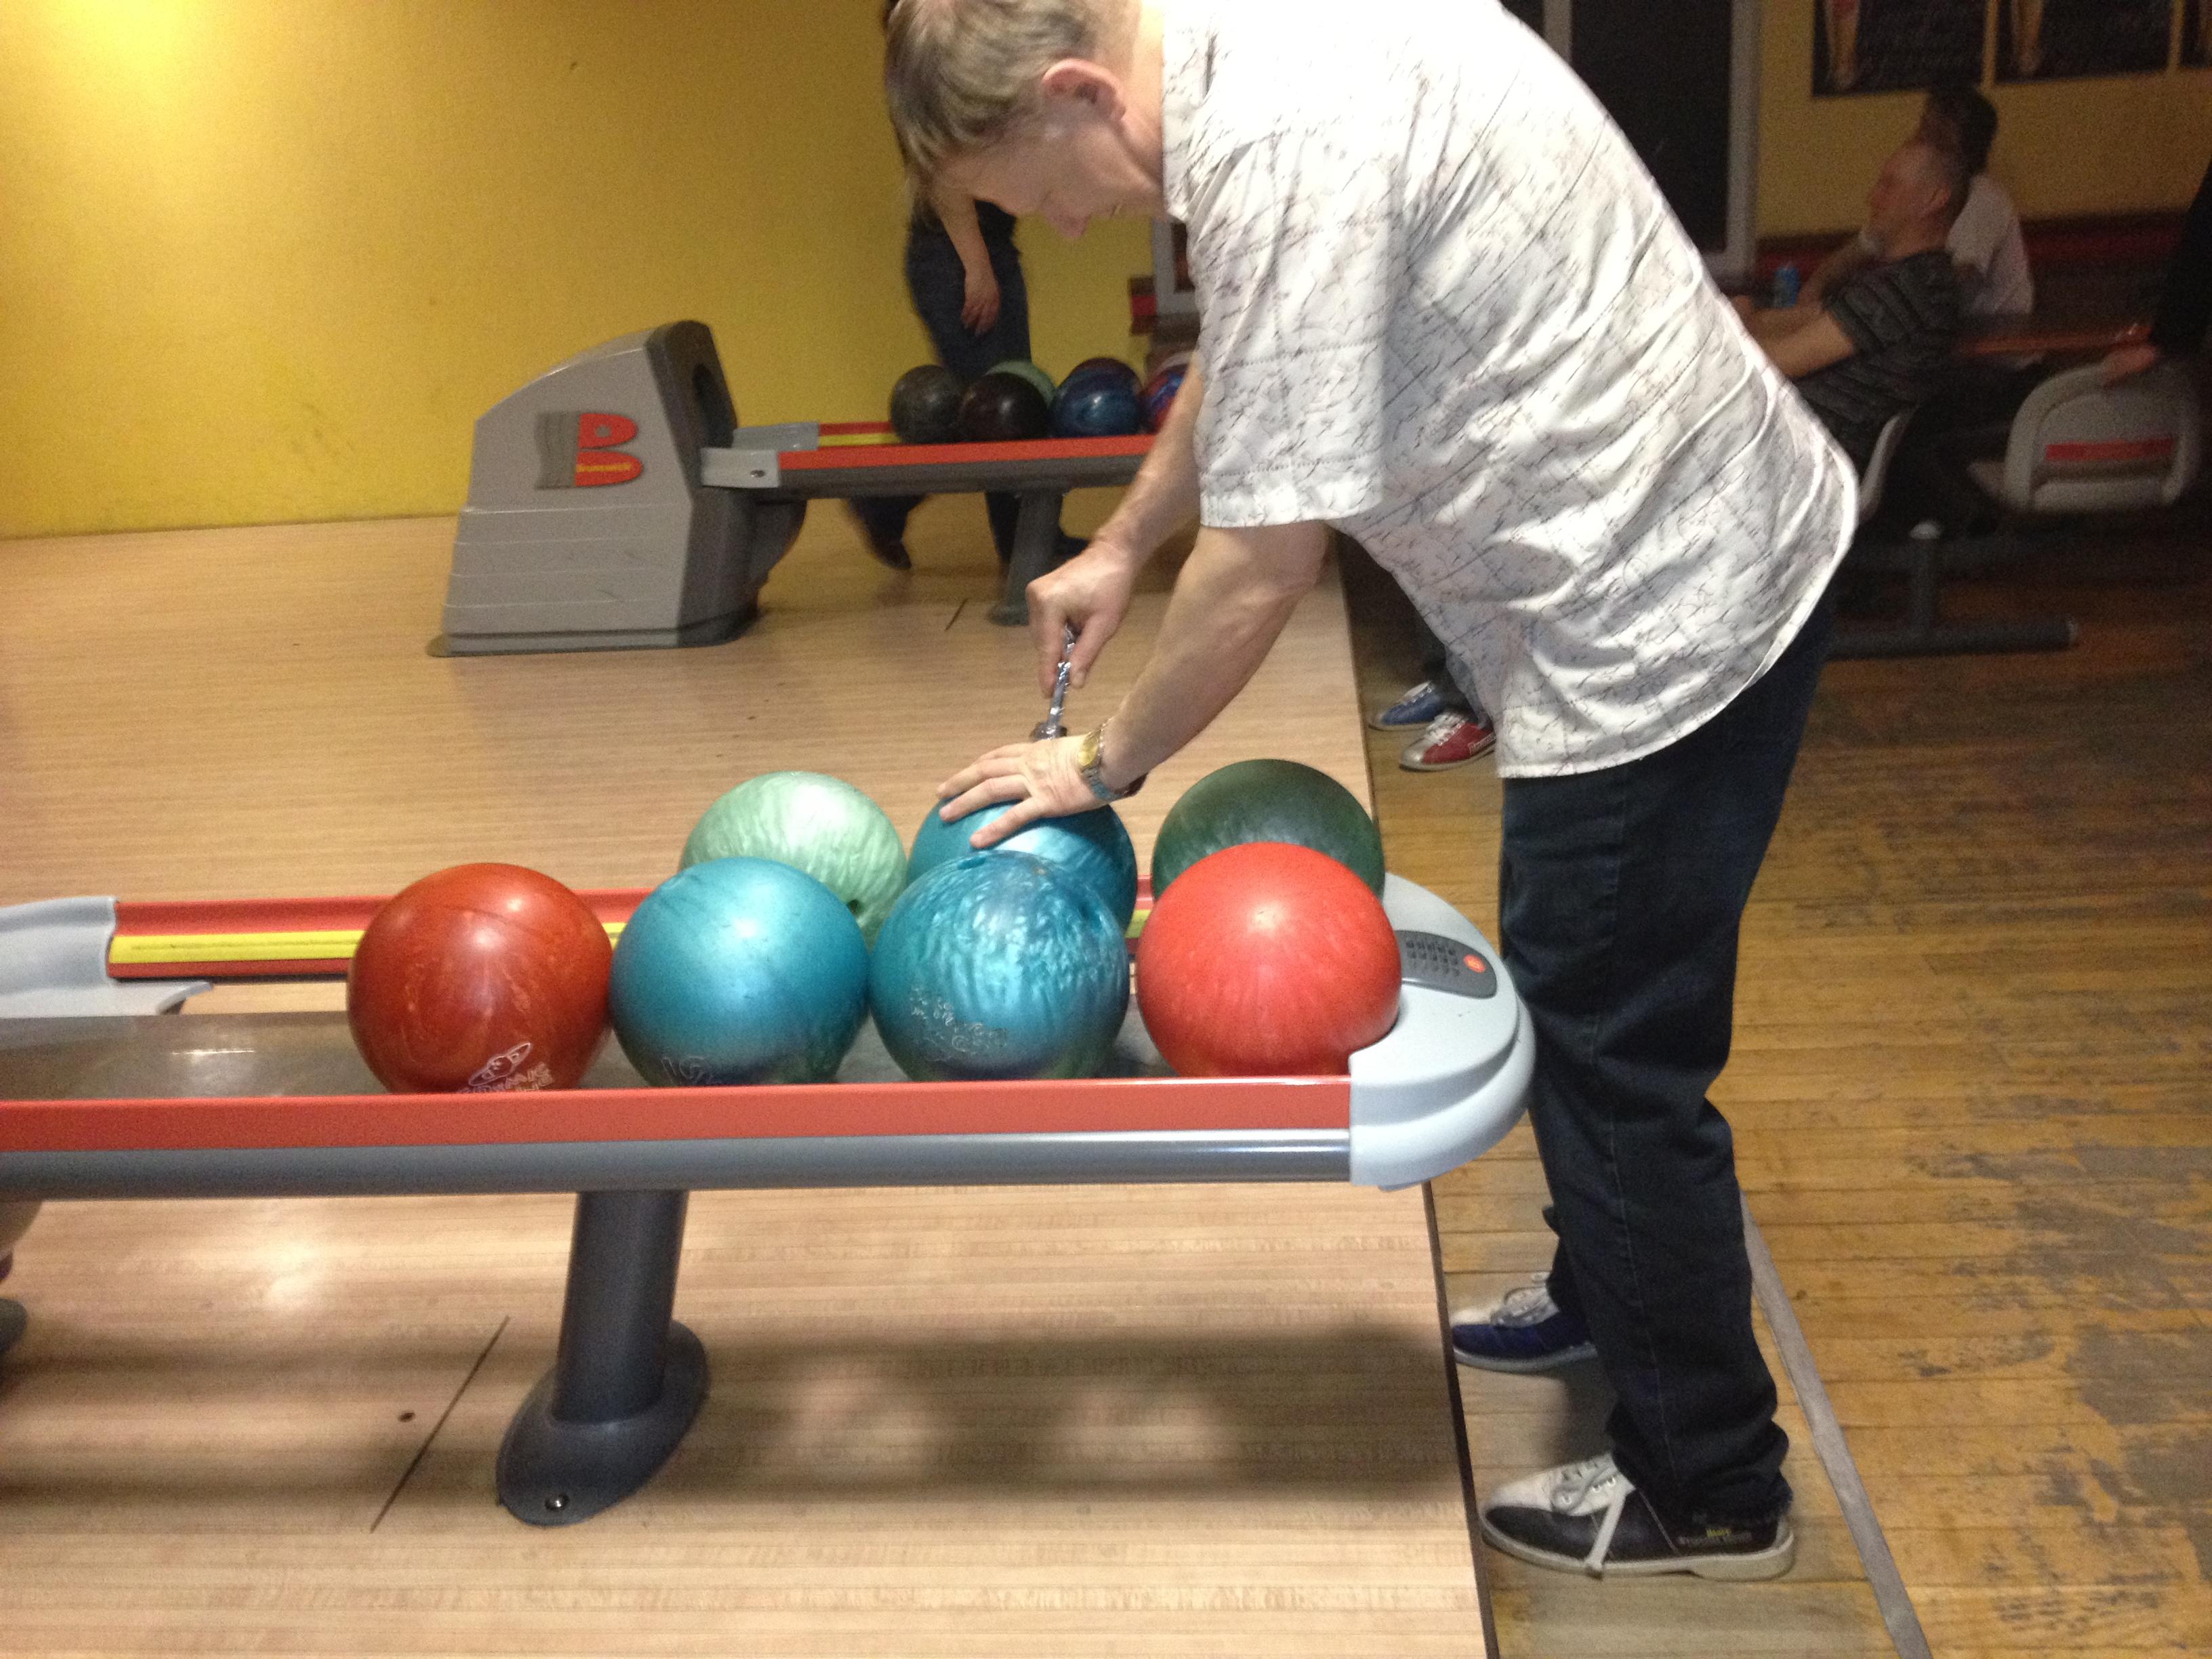 Bowlingu kuuli puurija